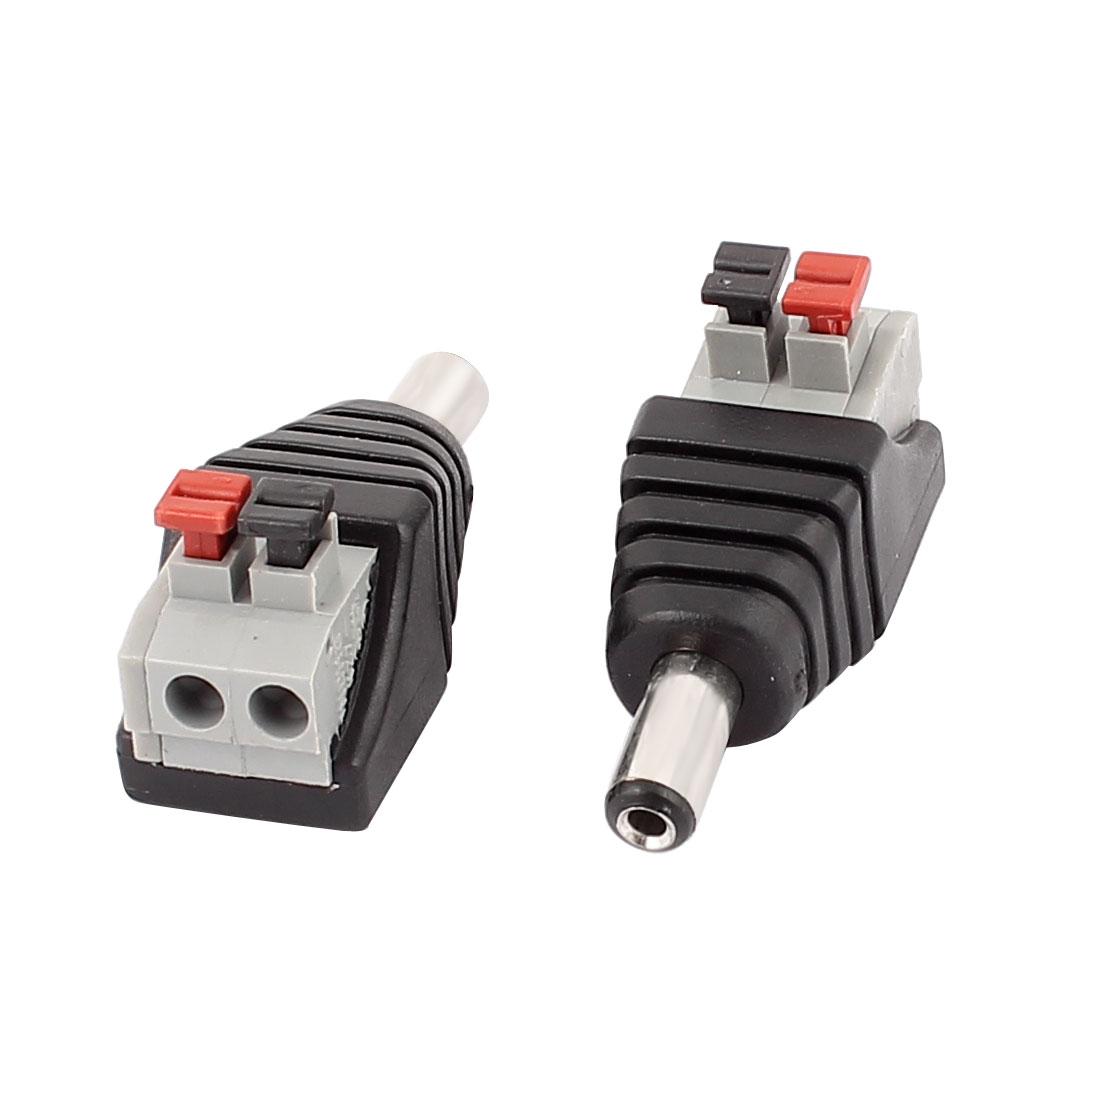 2Pcs CCTV Camera Clip Type Terminal Block 2.1x5.5mm DC Power Male Jack